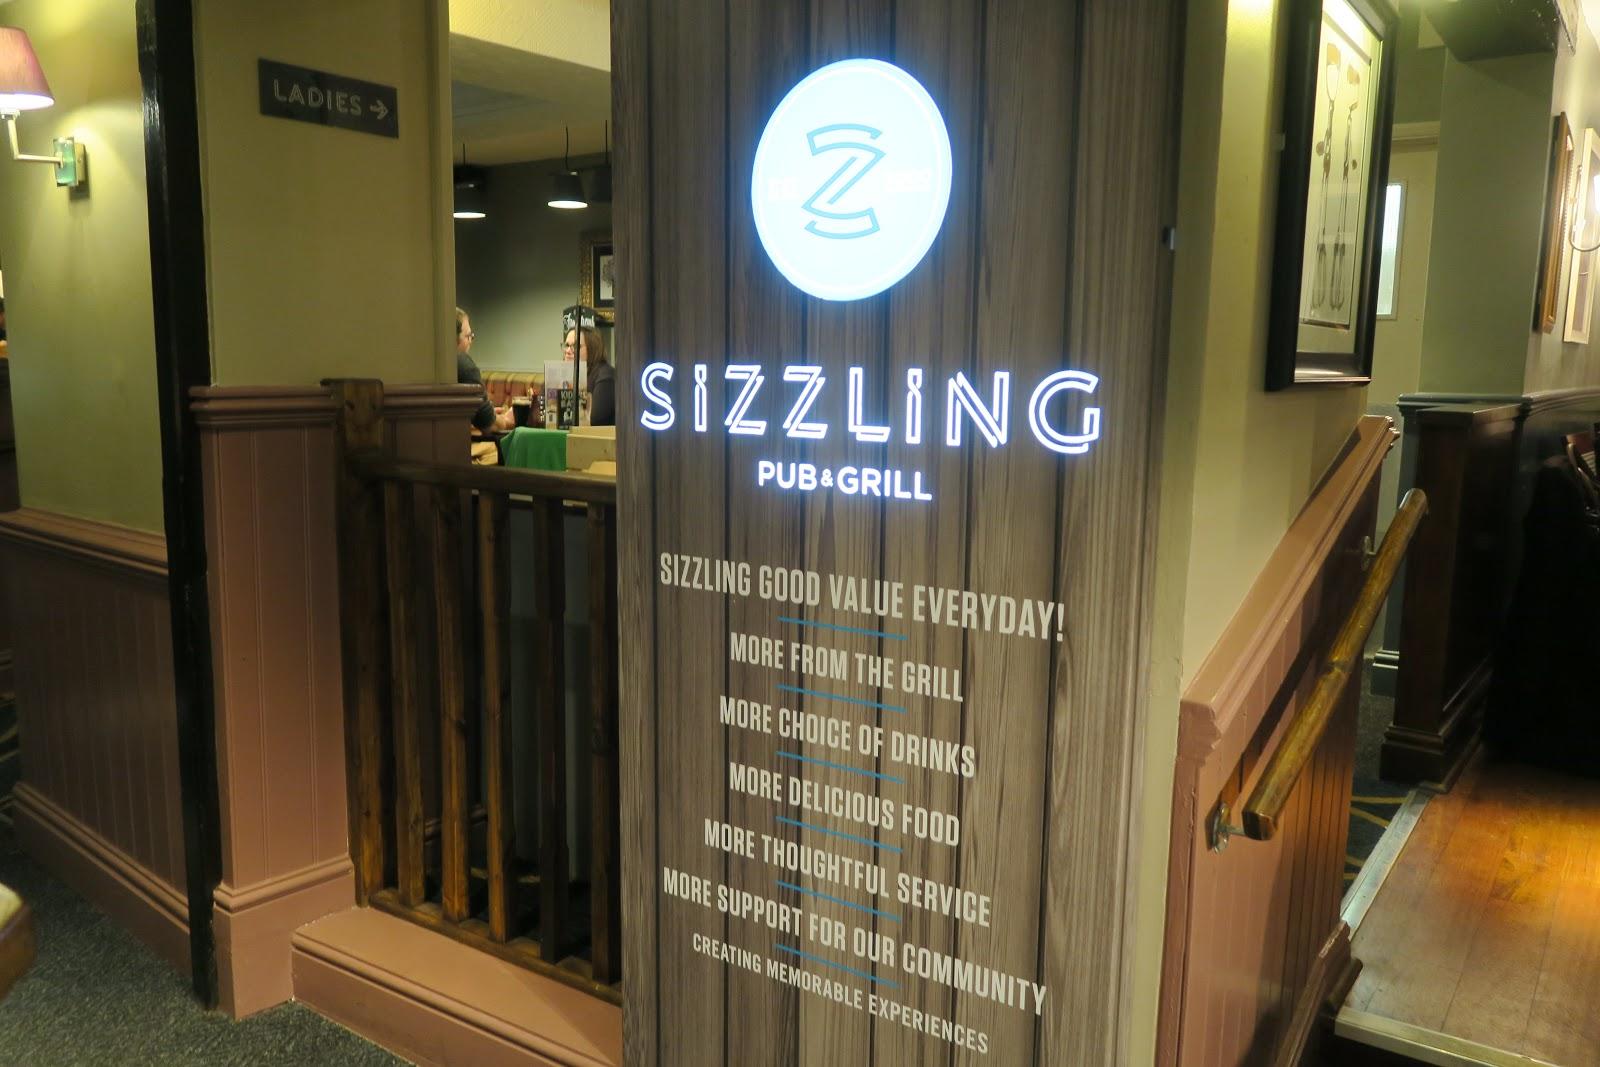 custom neon font for Sizzling Pub